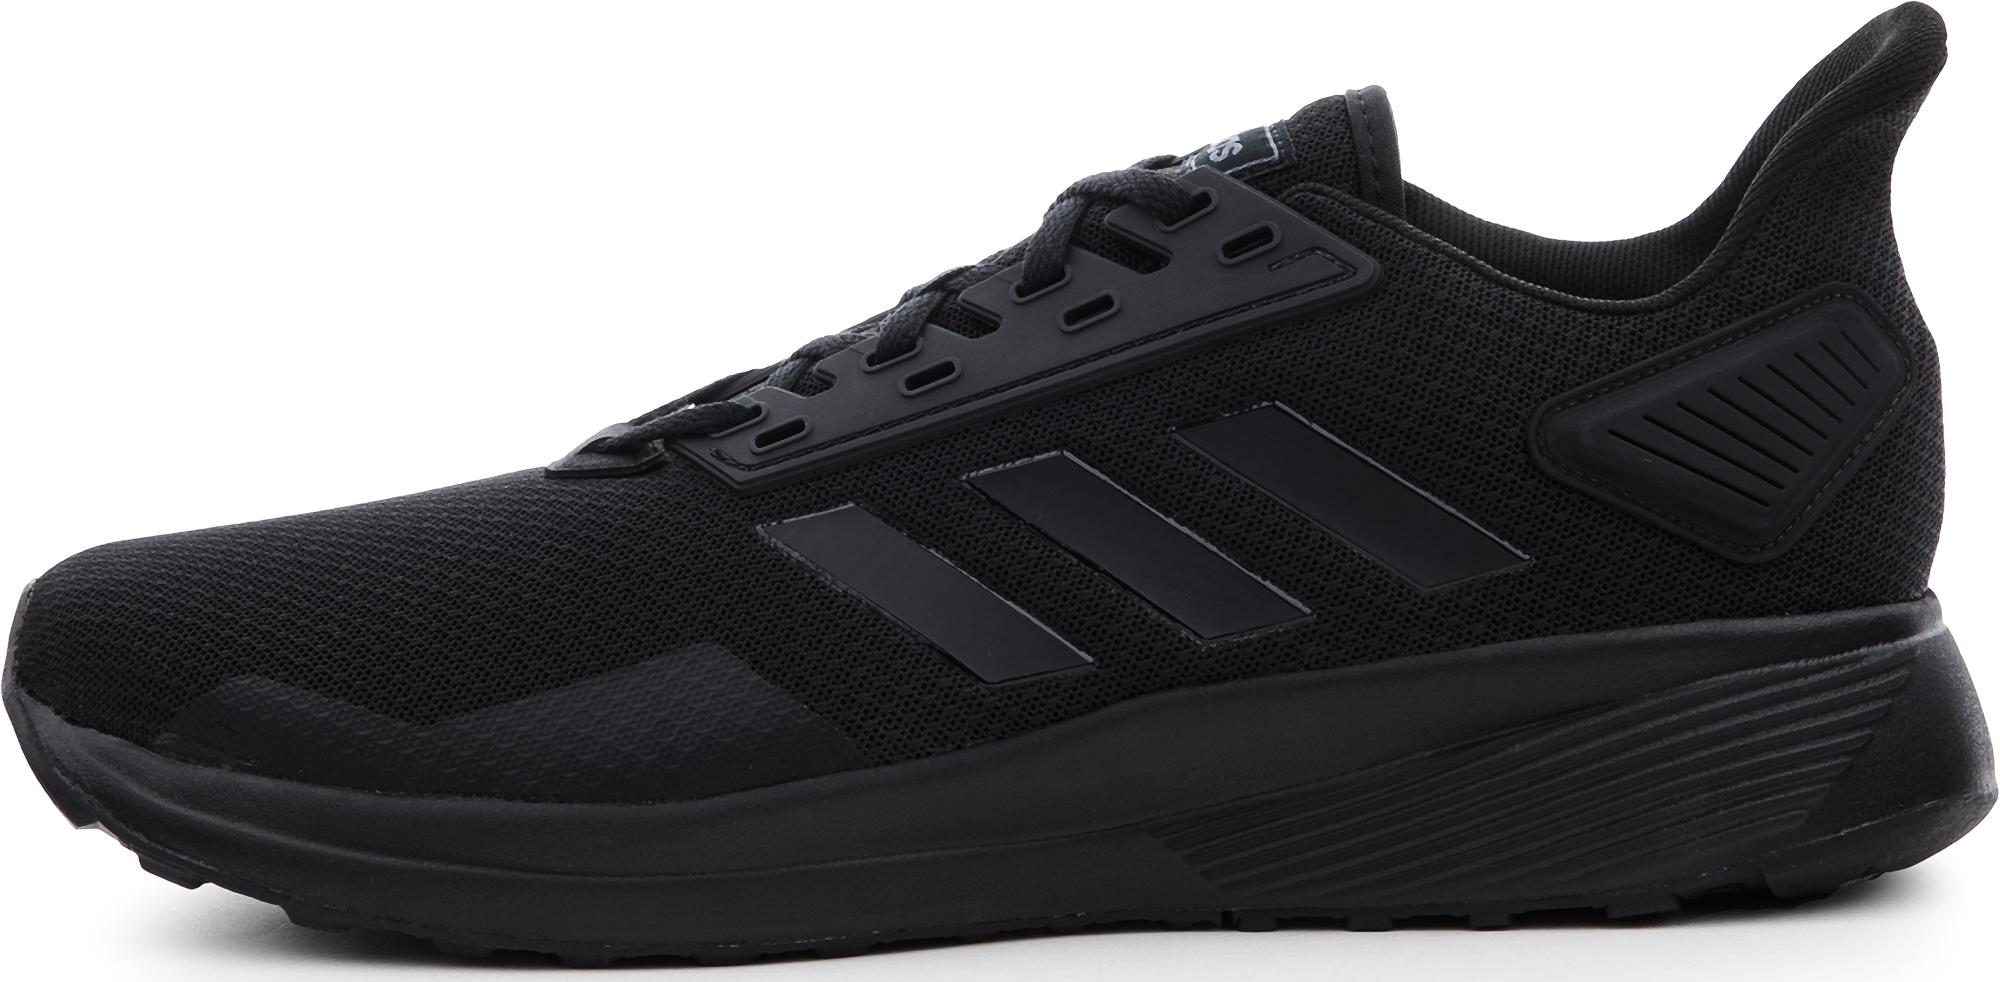 Adidas Кроссовки мужские Adidas Duramo 9, размер 44,5 цена